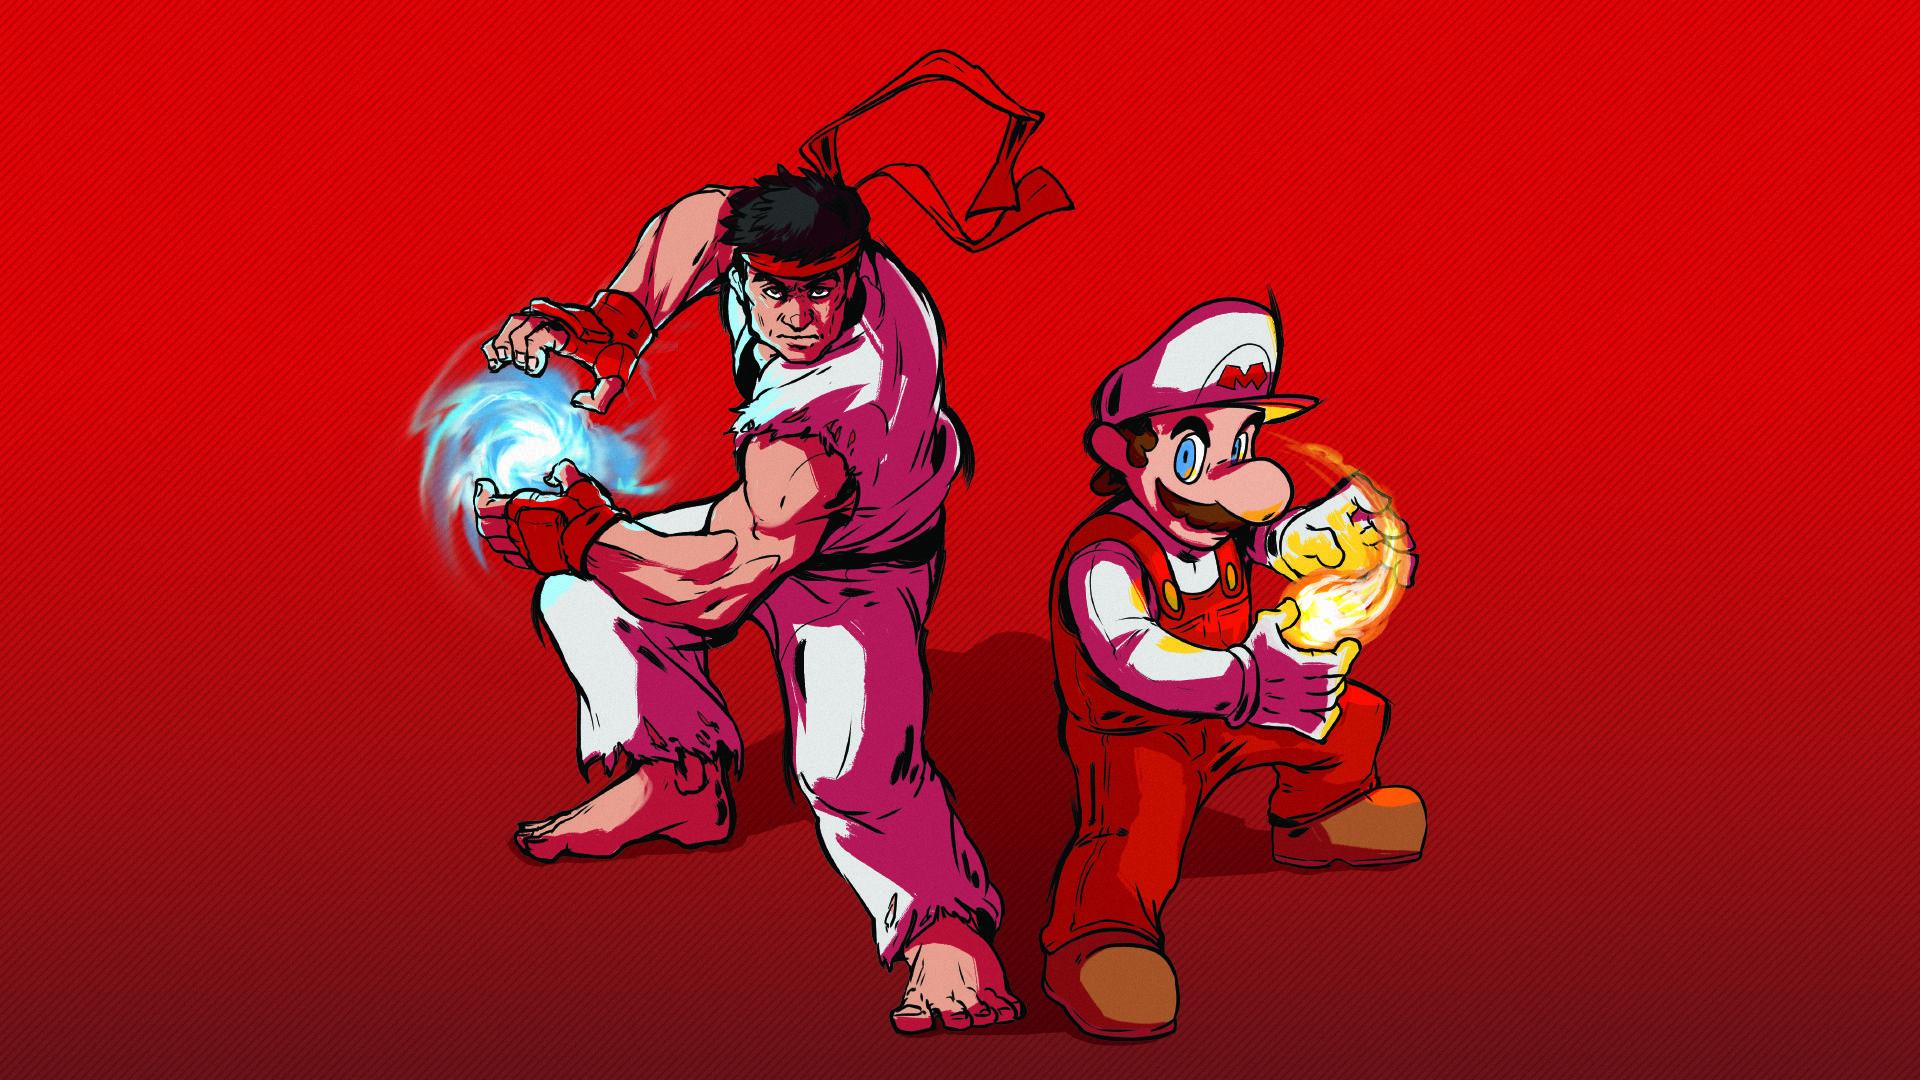 Mario and Ryu dubs team! 1920 x 1080 Need iPhone 6S